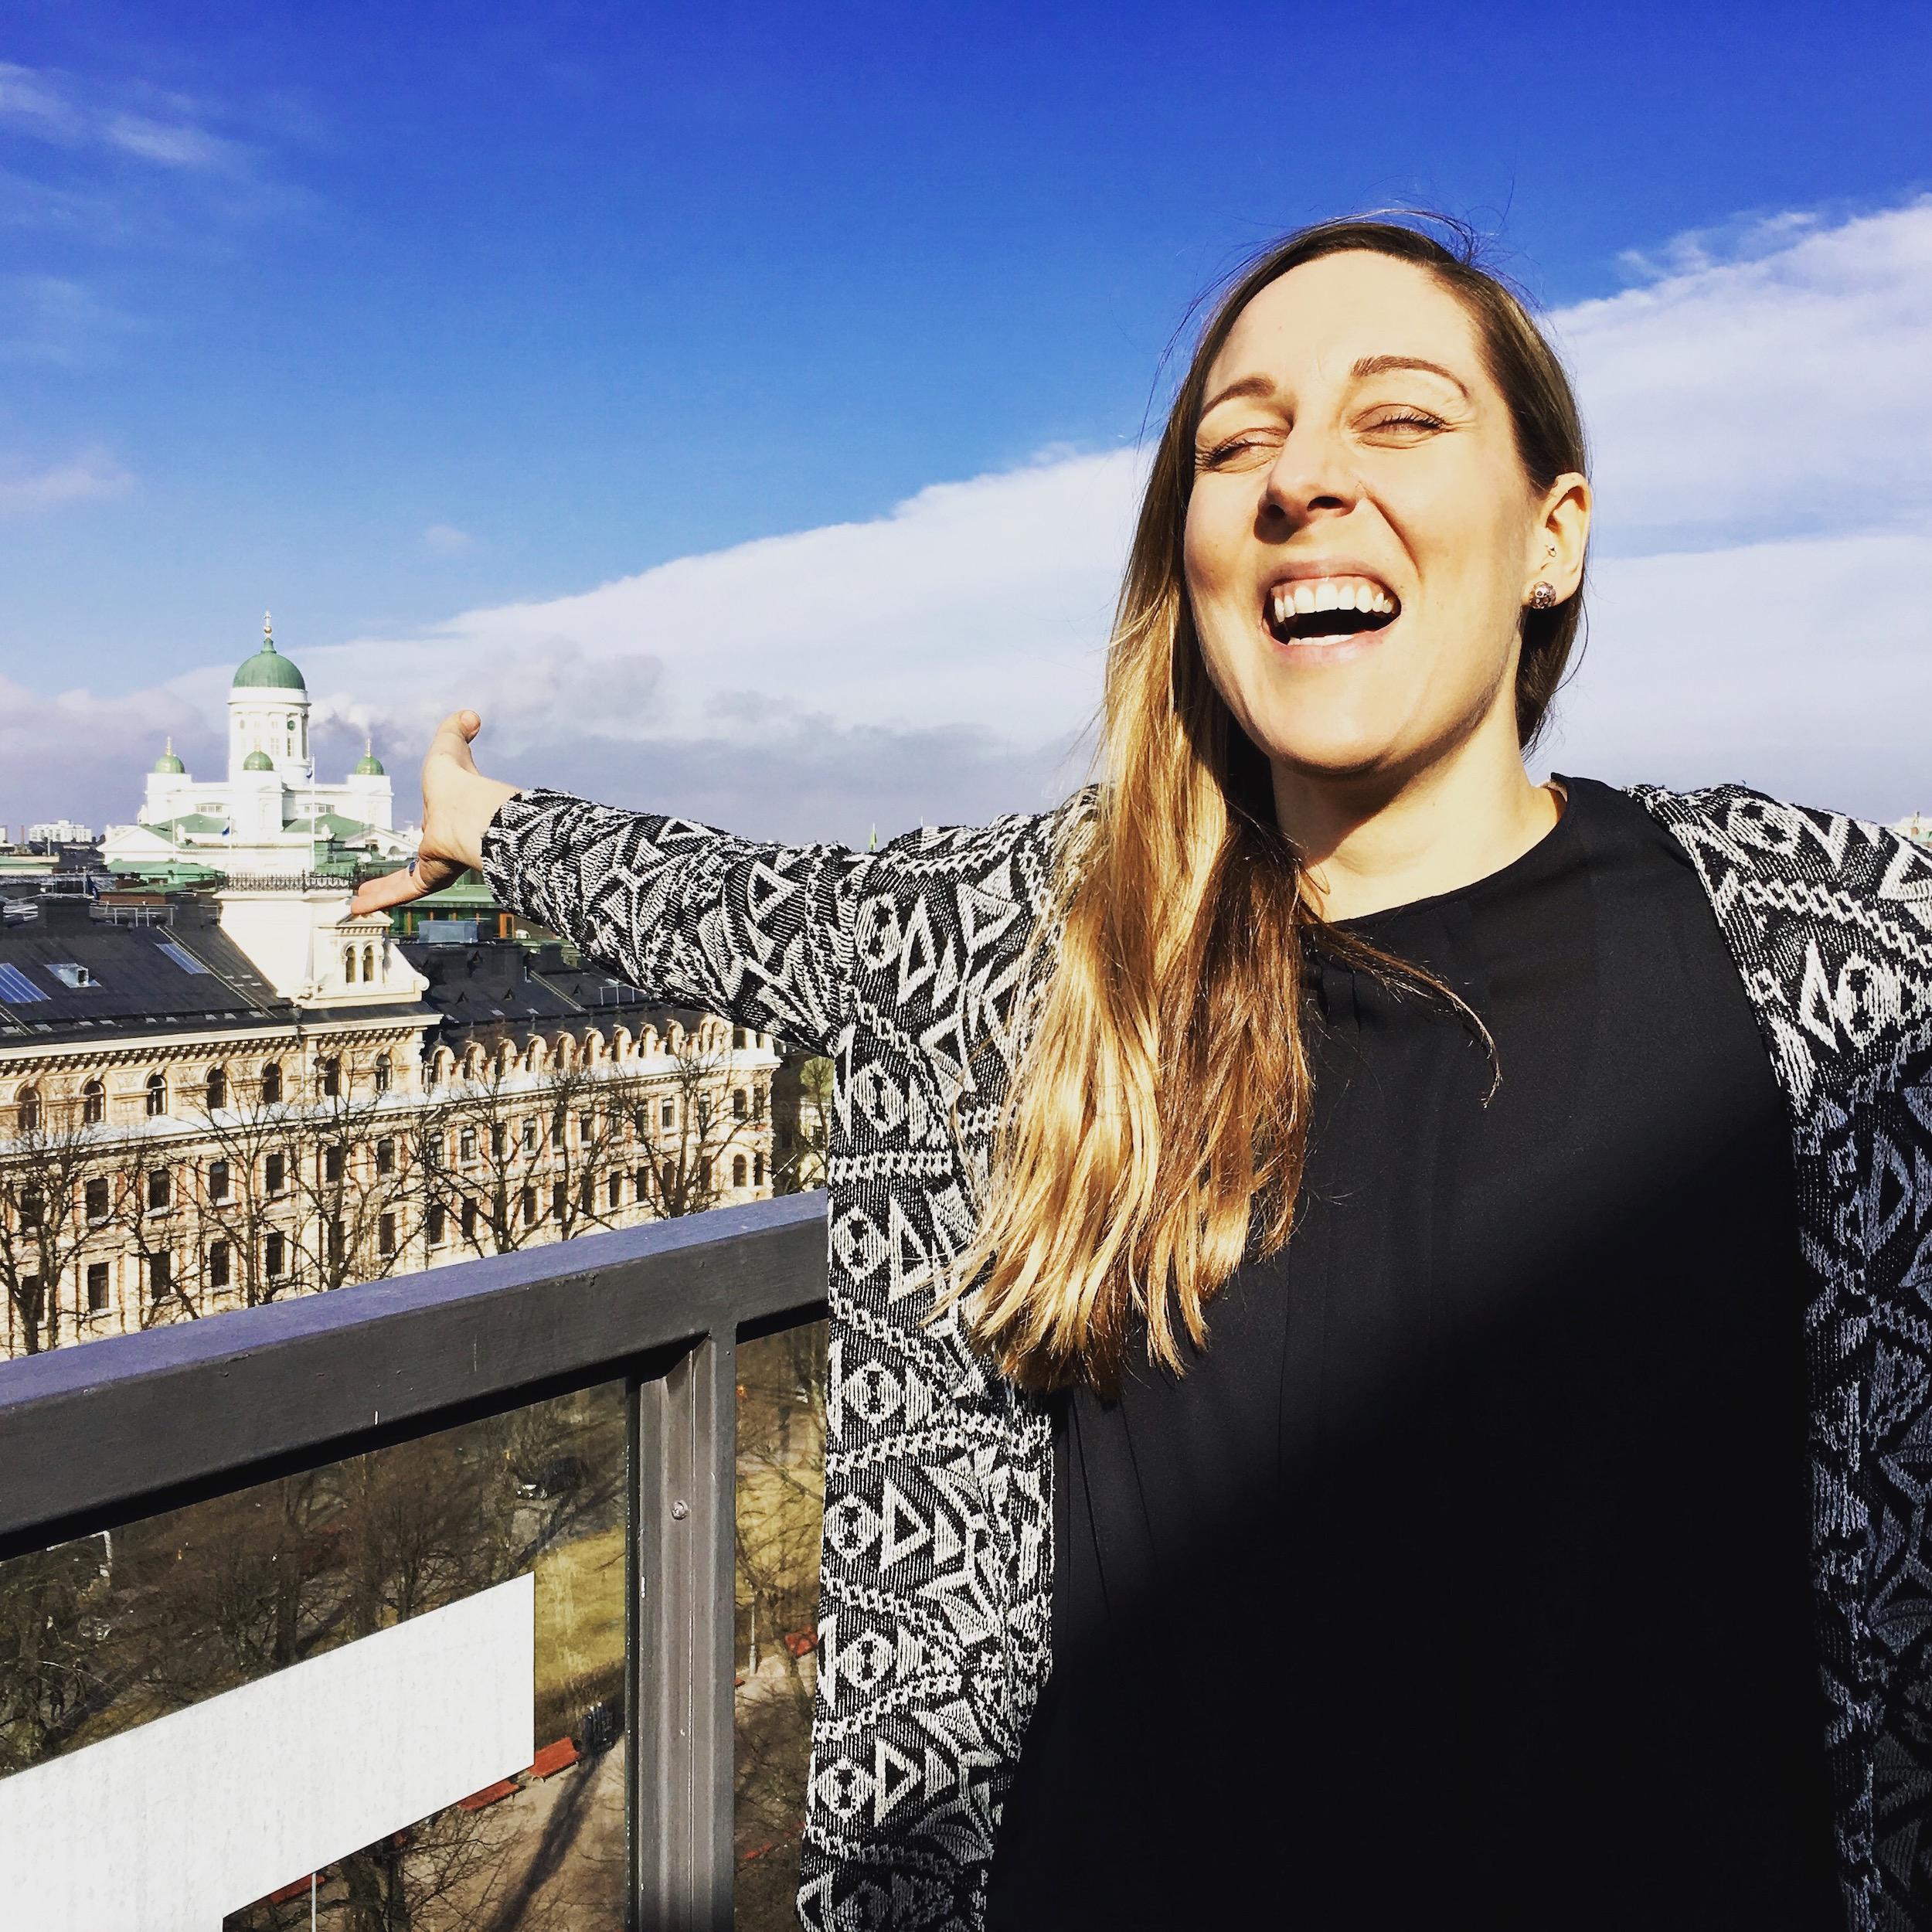 Maddalena Helsingin kattojen yllä